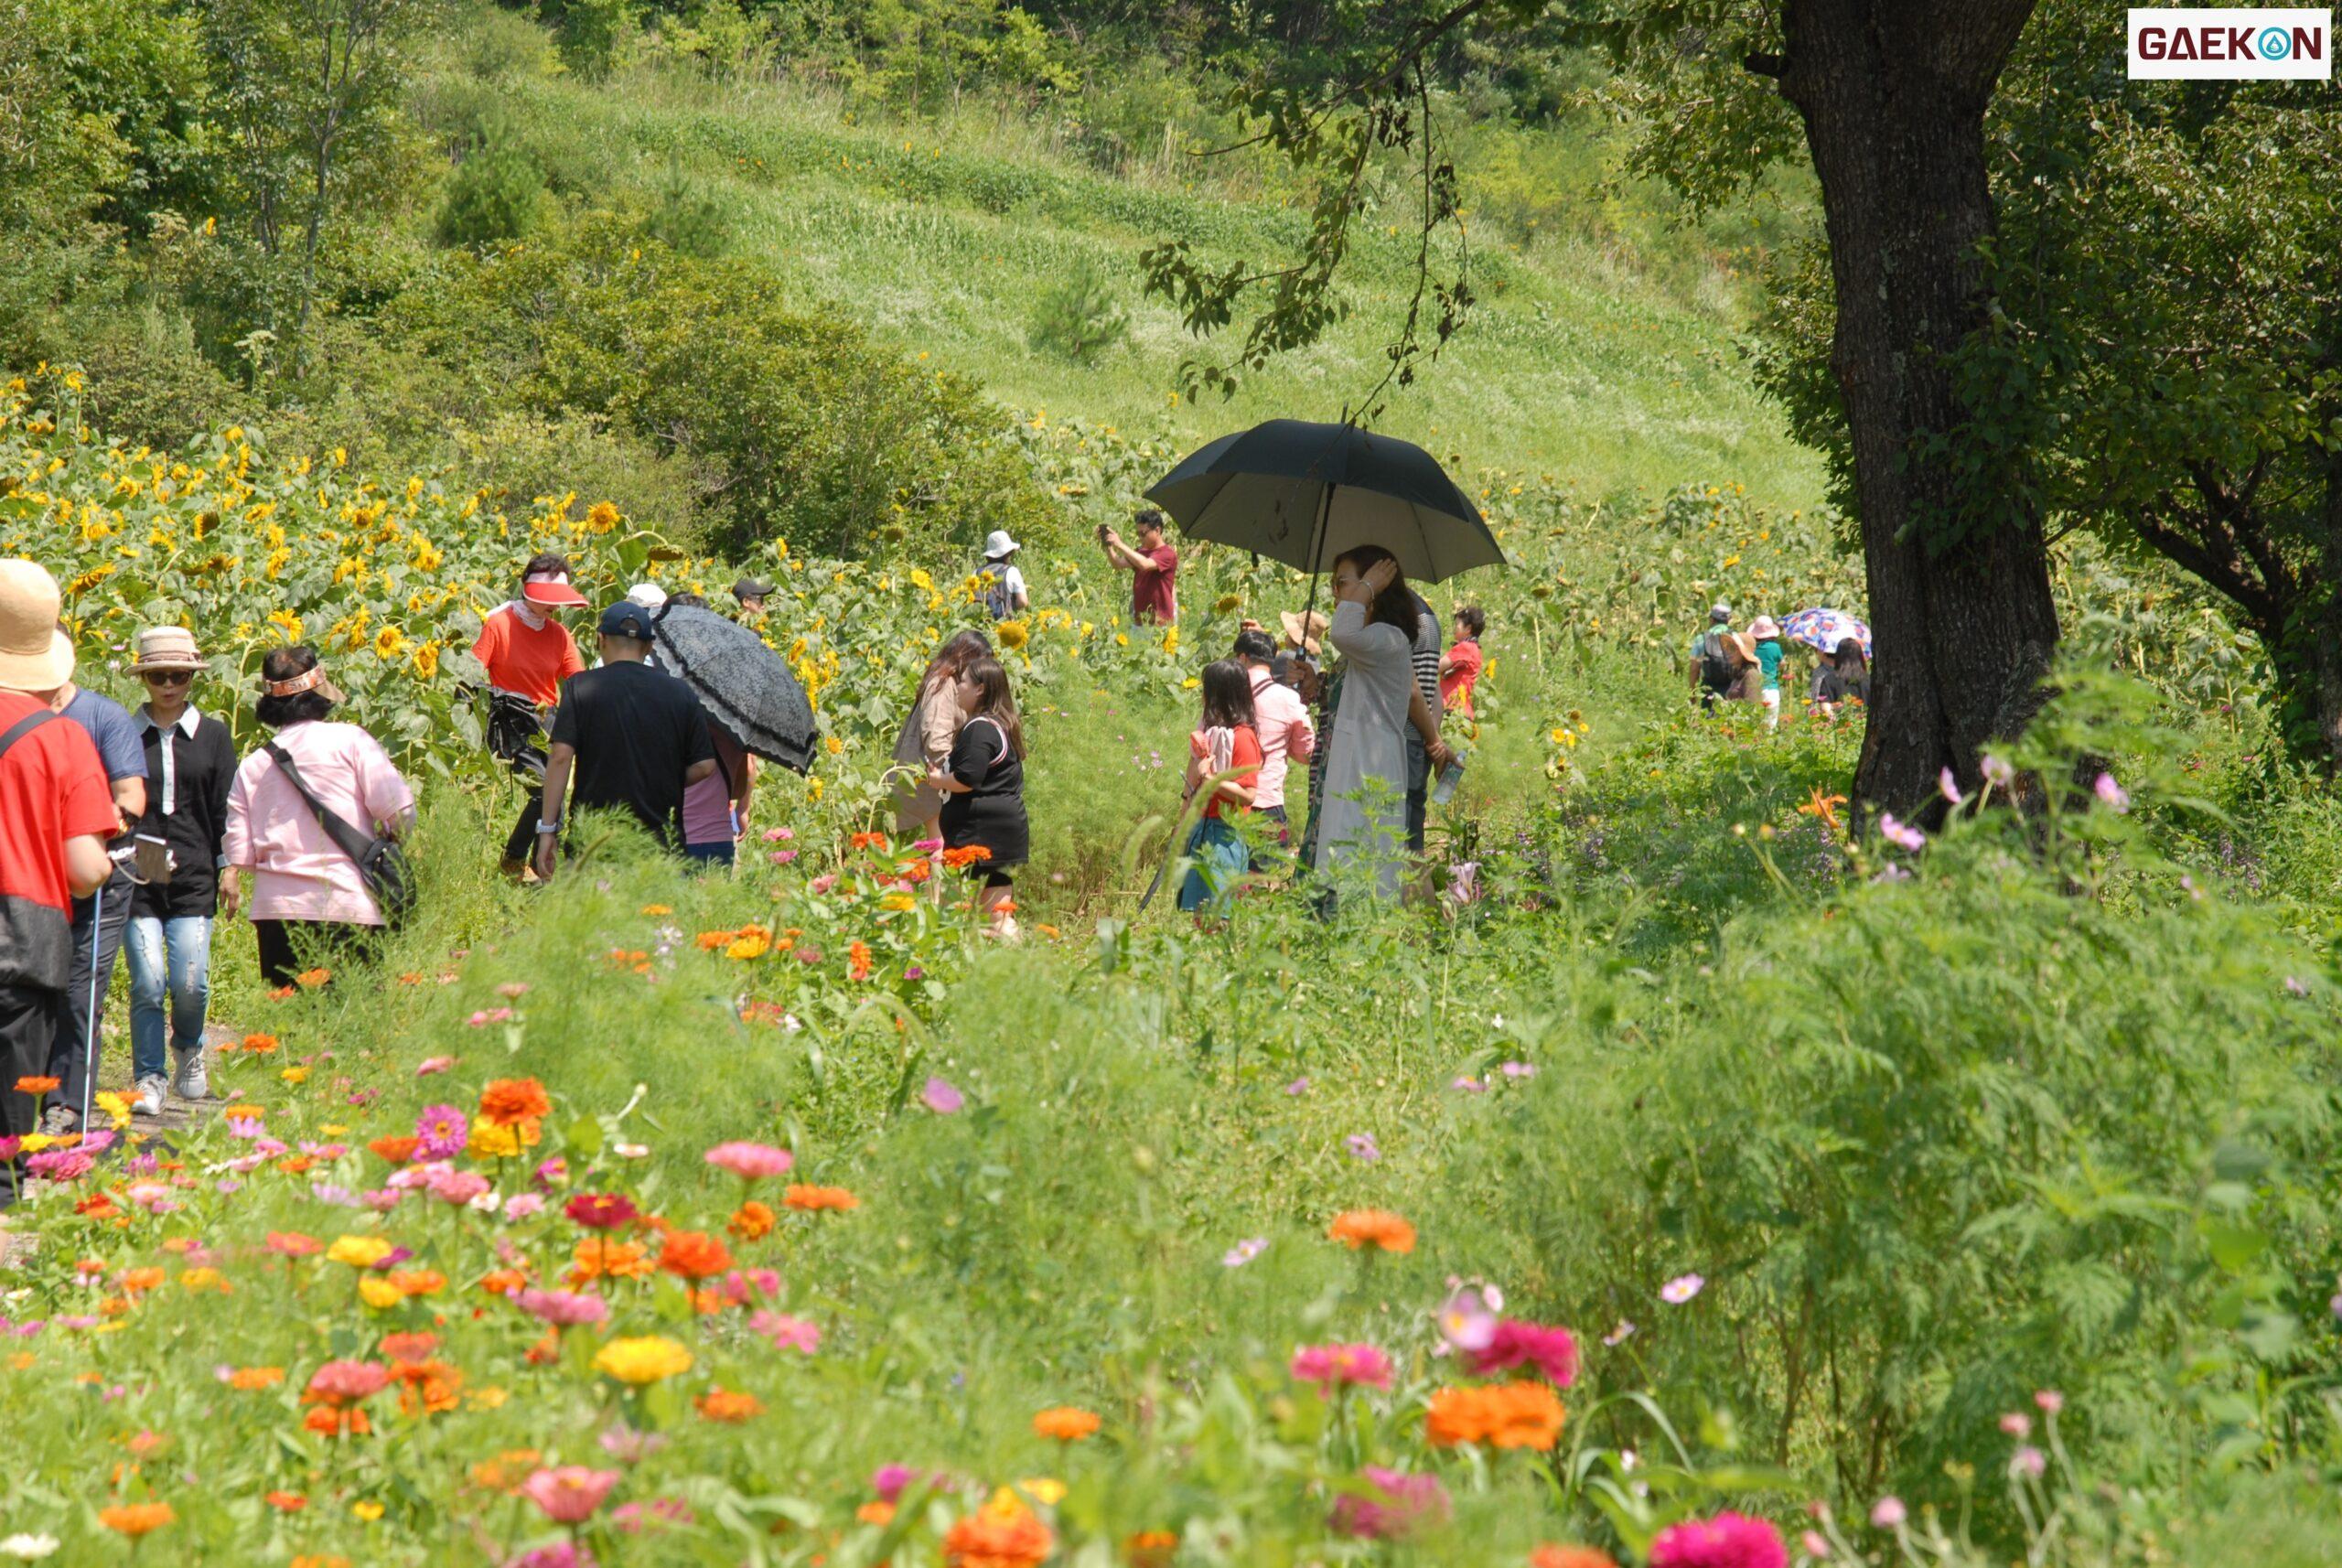 Festival Bunga Matahari Taebaek Siap Warnai Harimu Gaekon